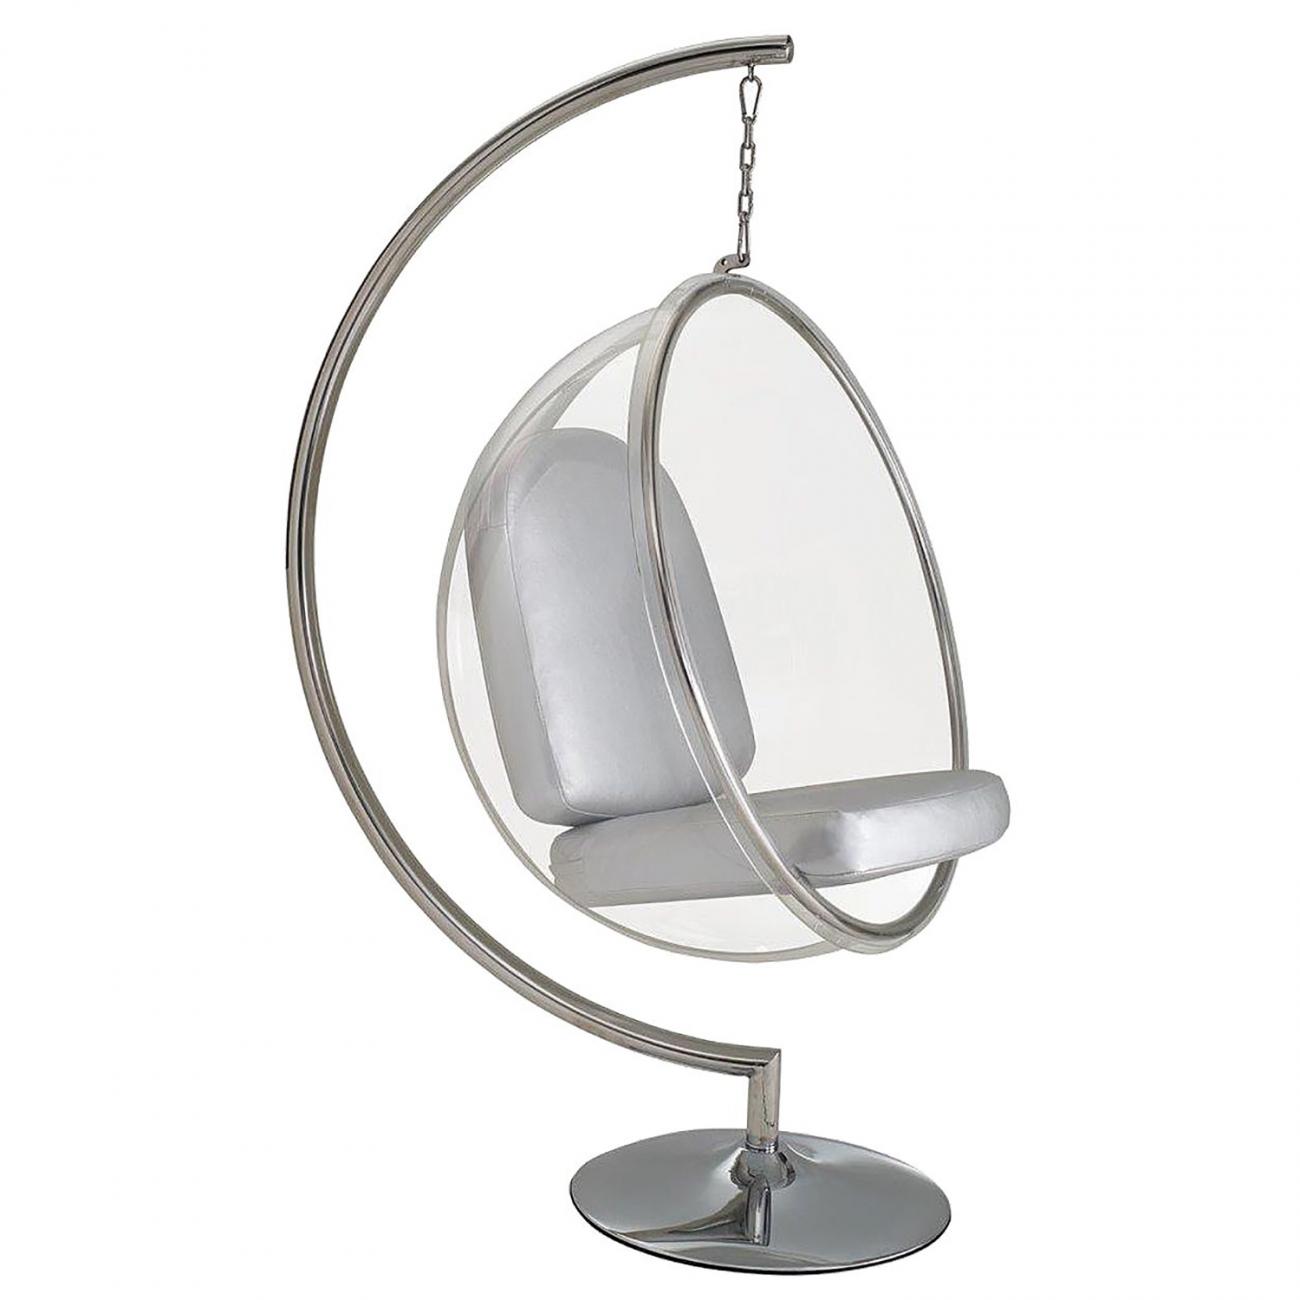 bubble chair with stand alps king kong Кресло Серебряная Экокожа купить